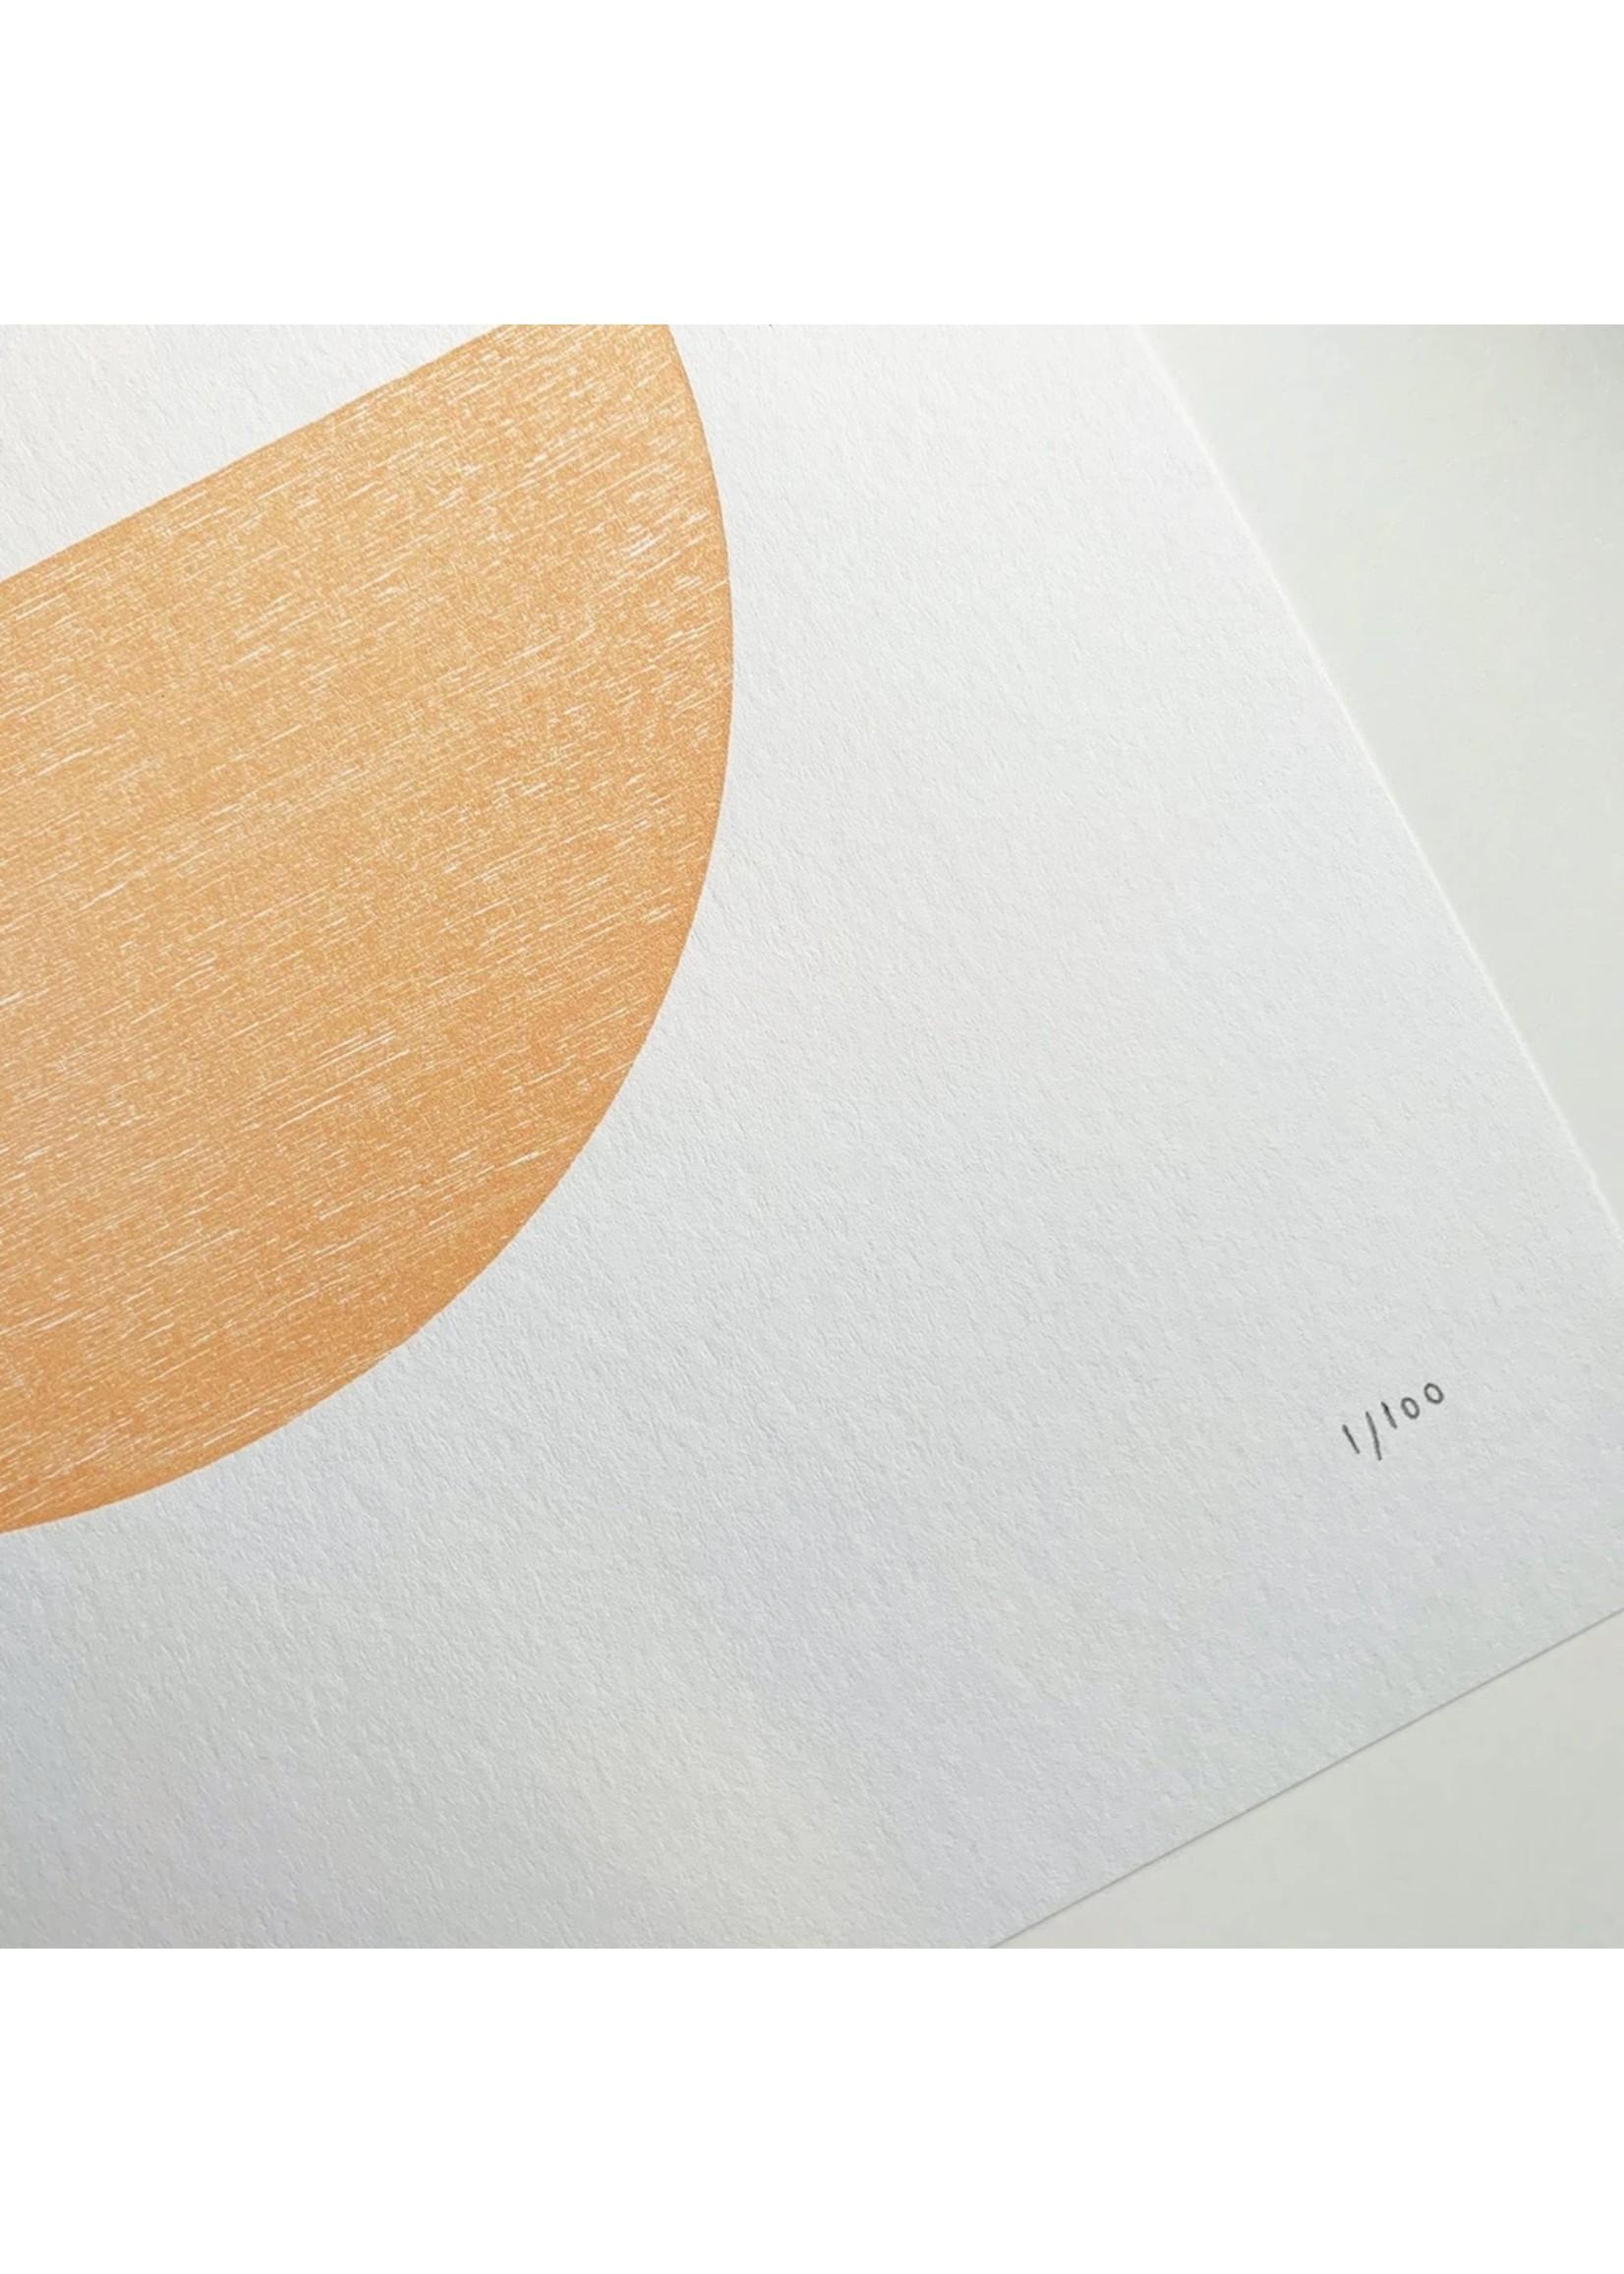 Tom Pigeon Tom Pigeon Hatch 1 Letterpress Print - 30x40cm